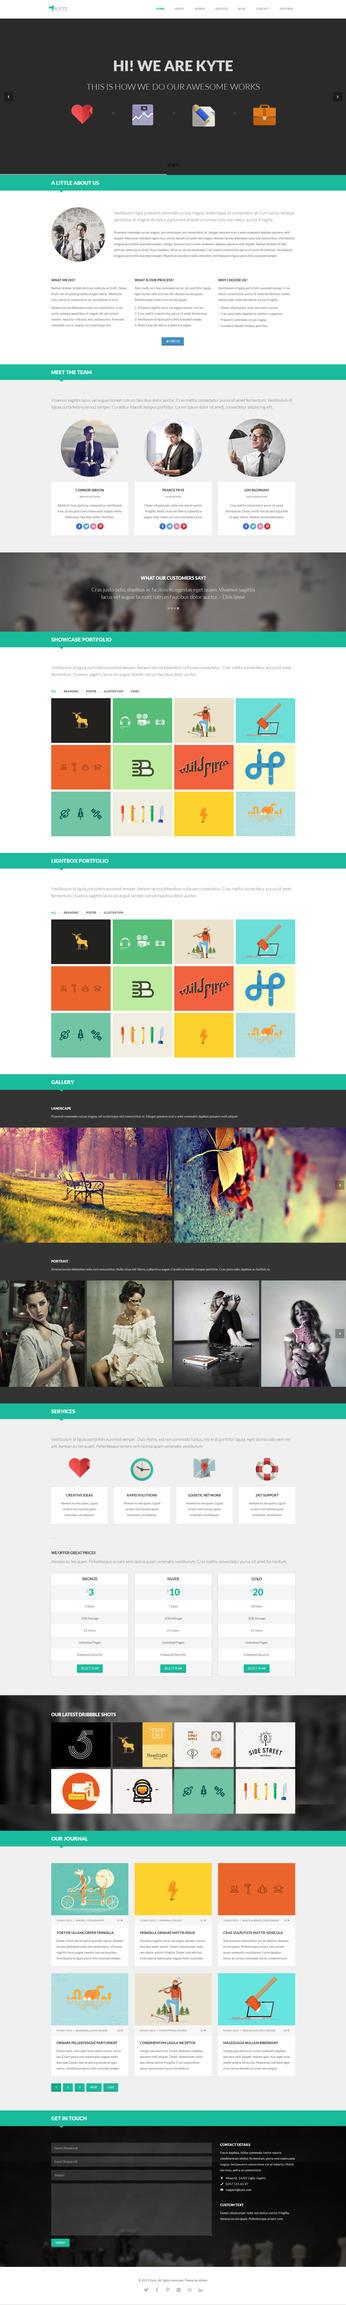 Kyte - Flat Onepage Responsive HTML5 Template by DarkStaLkeRR